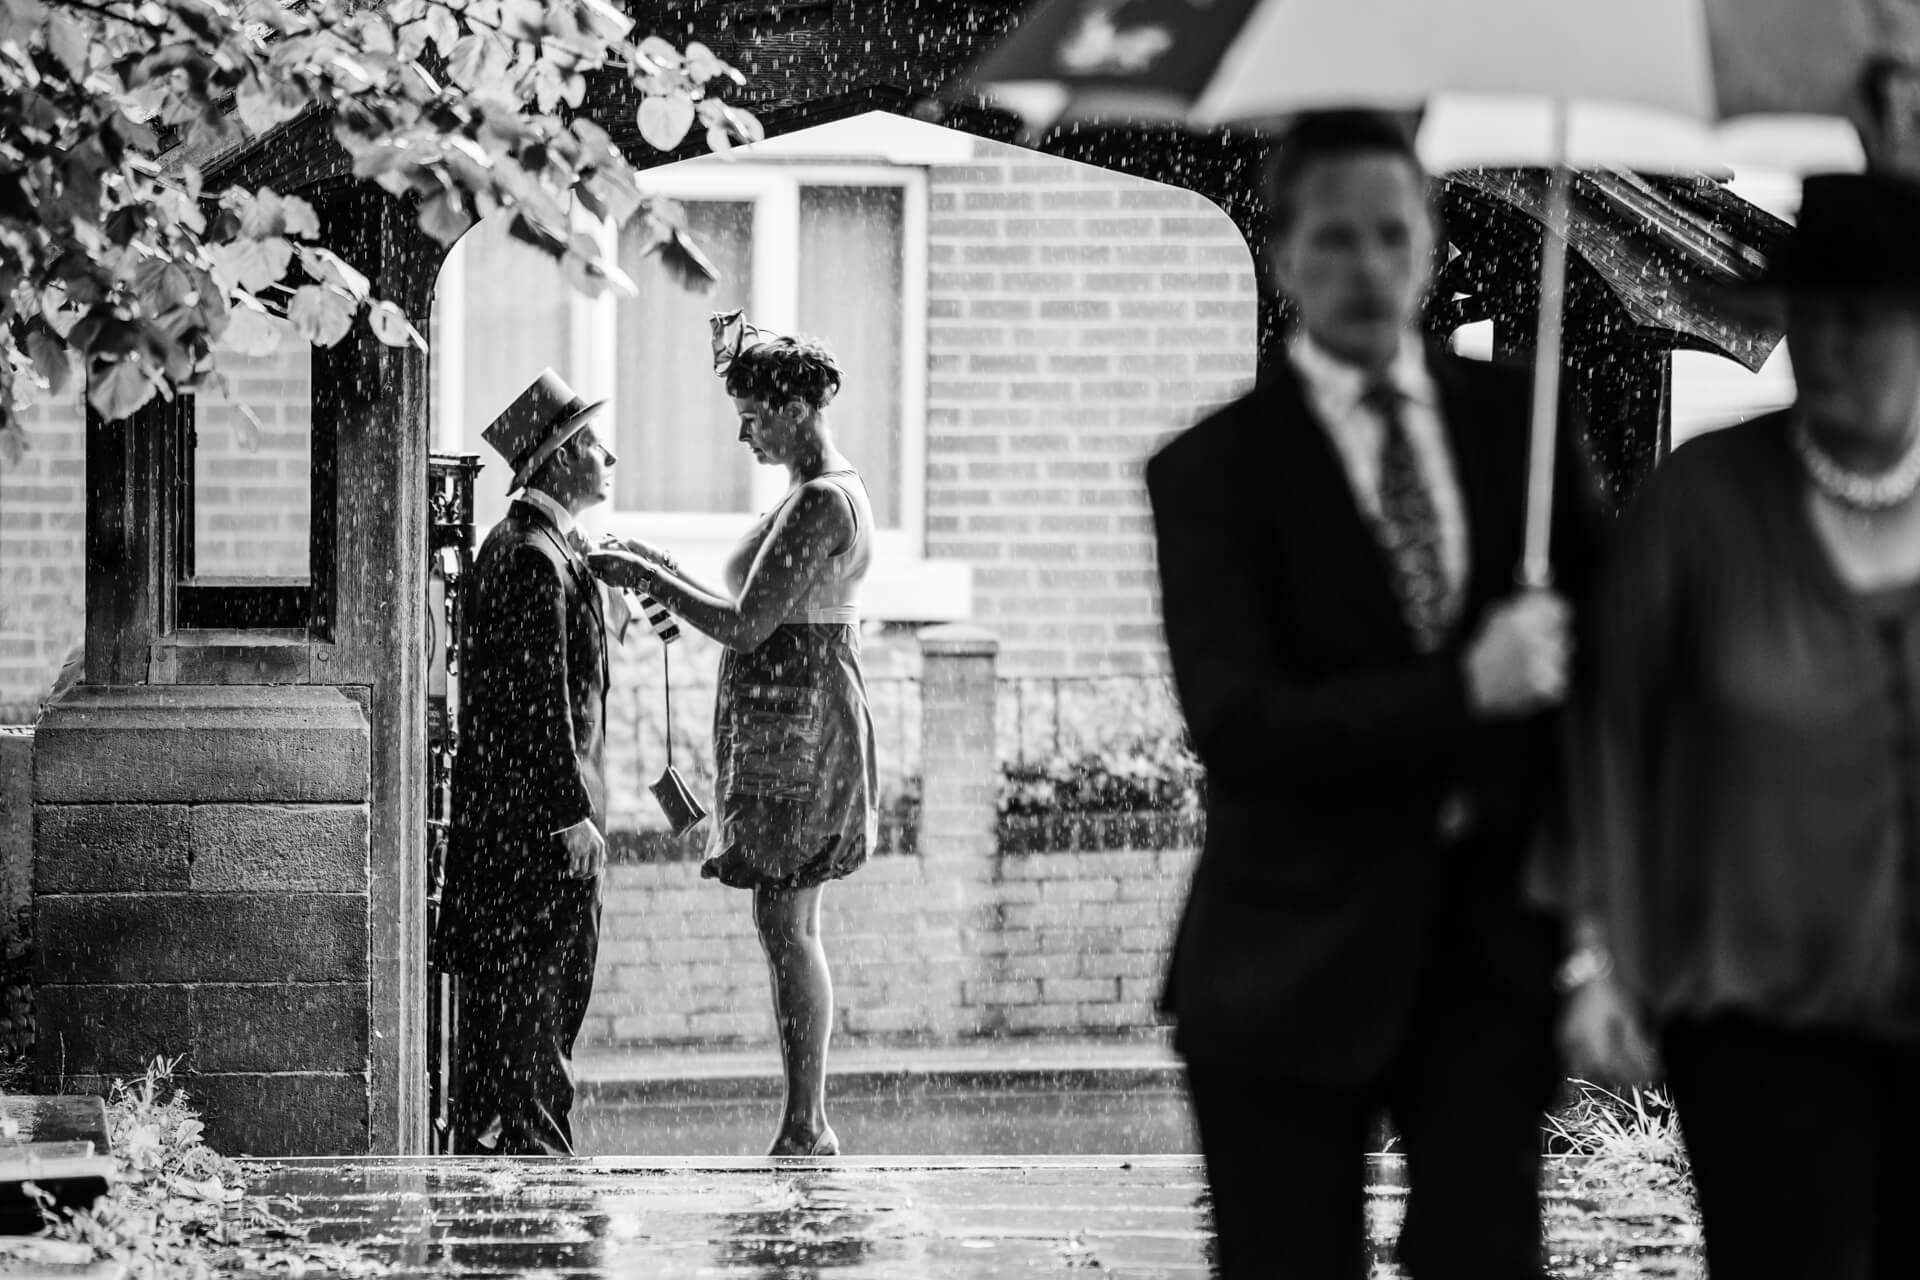 bridesmaid fixing a groomsman tie under a church arch in the rain